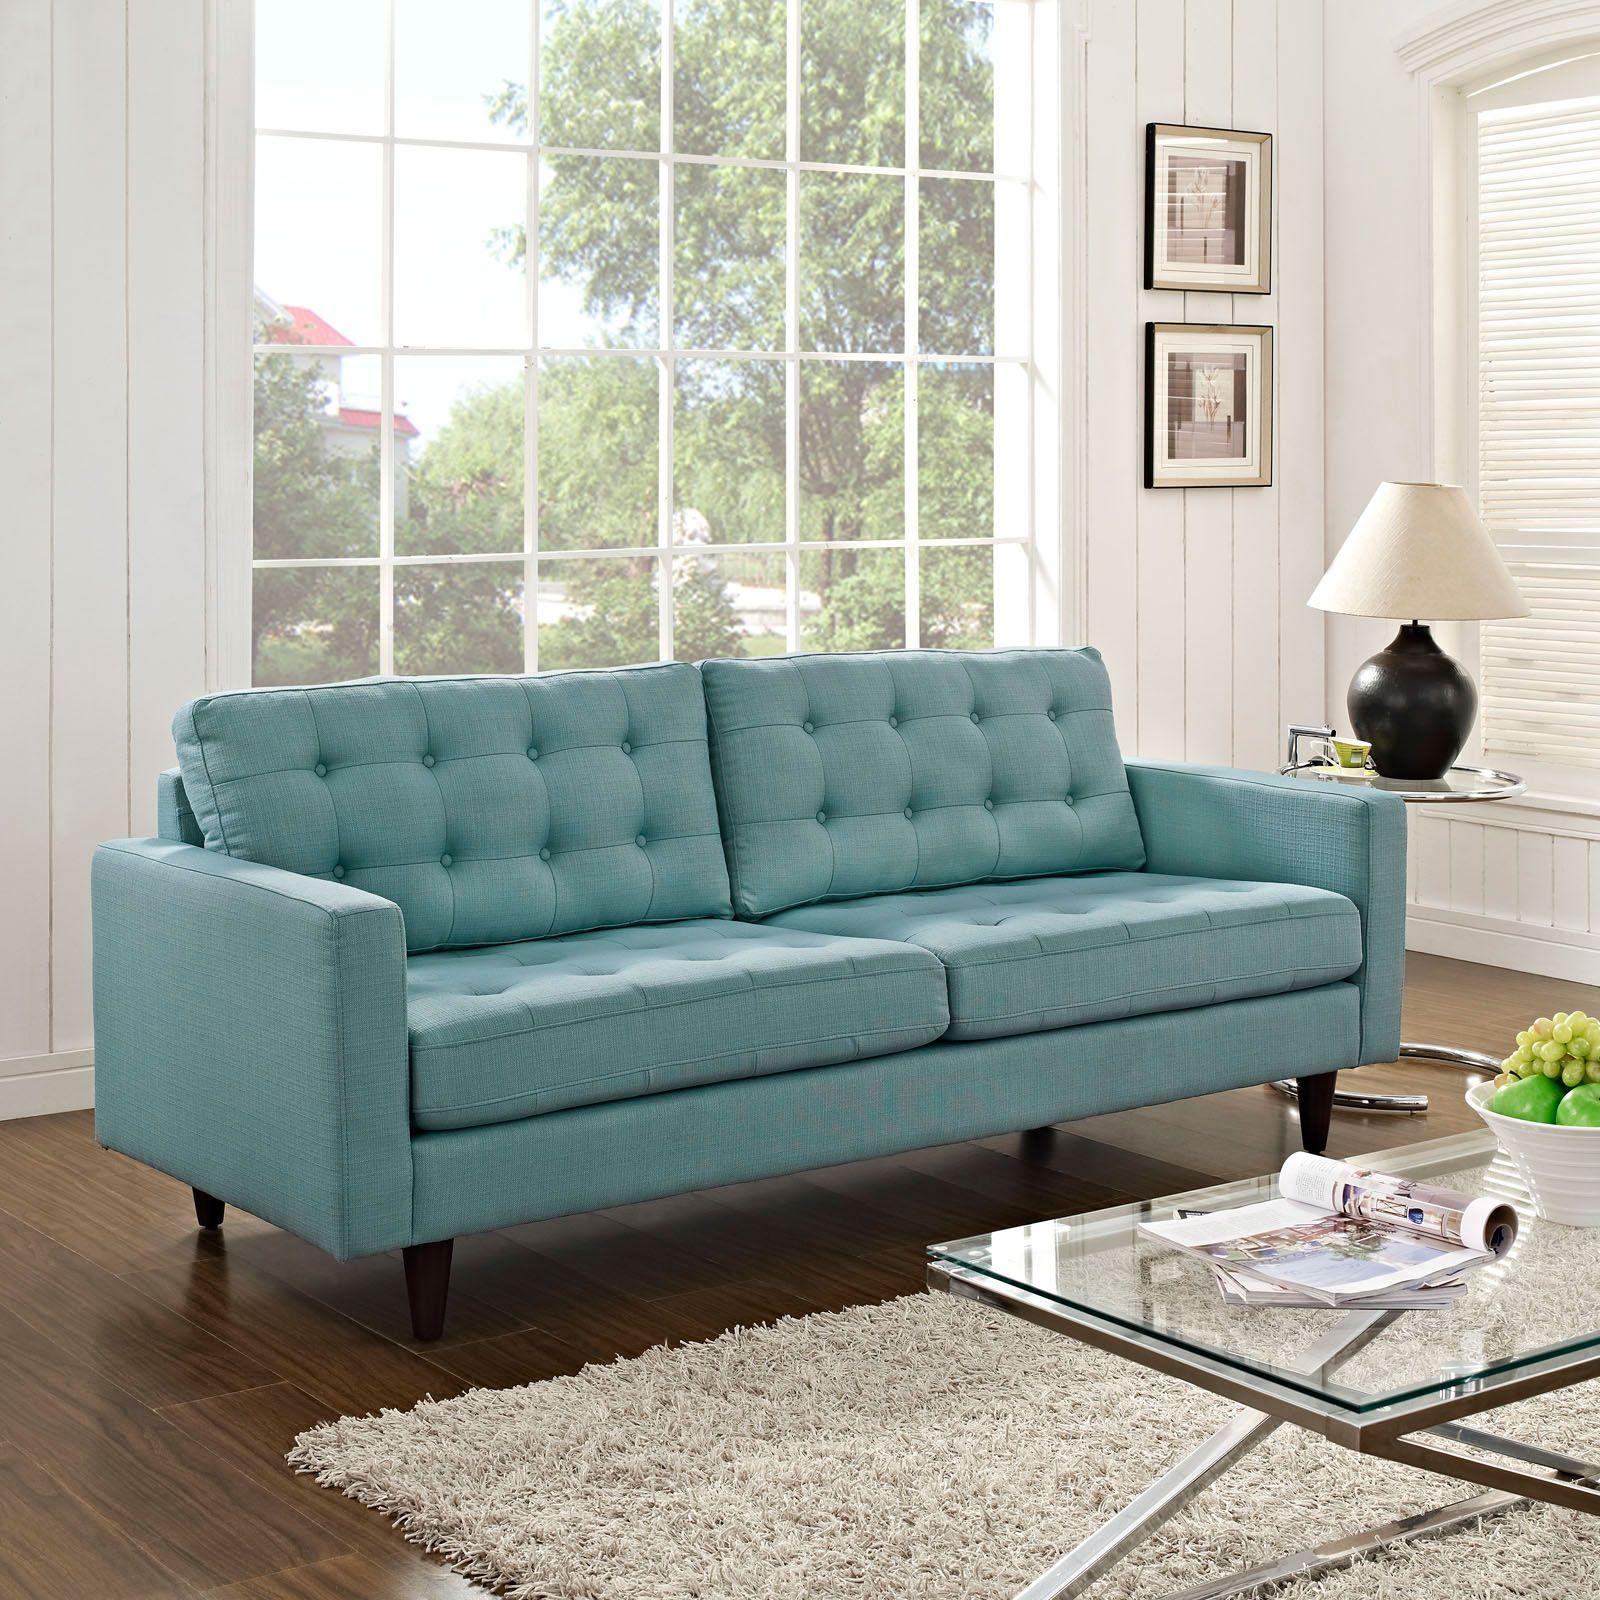 Fabris Sofa in Light Blue Divine Design Perfectly Mid Century